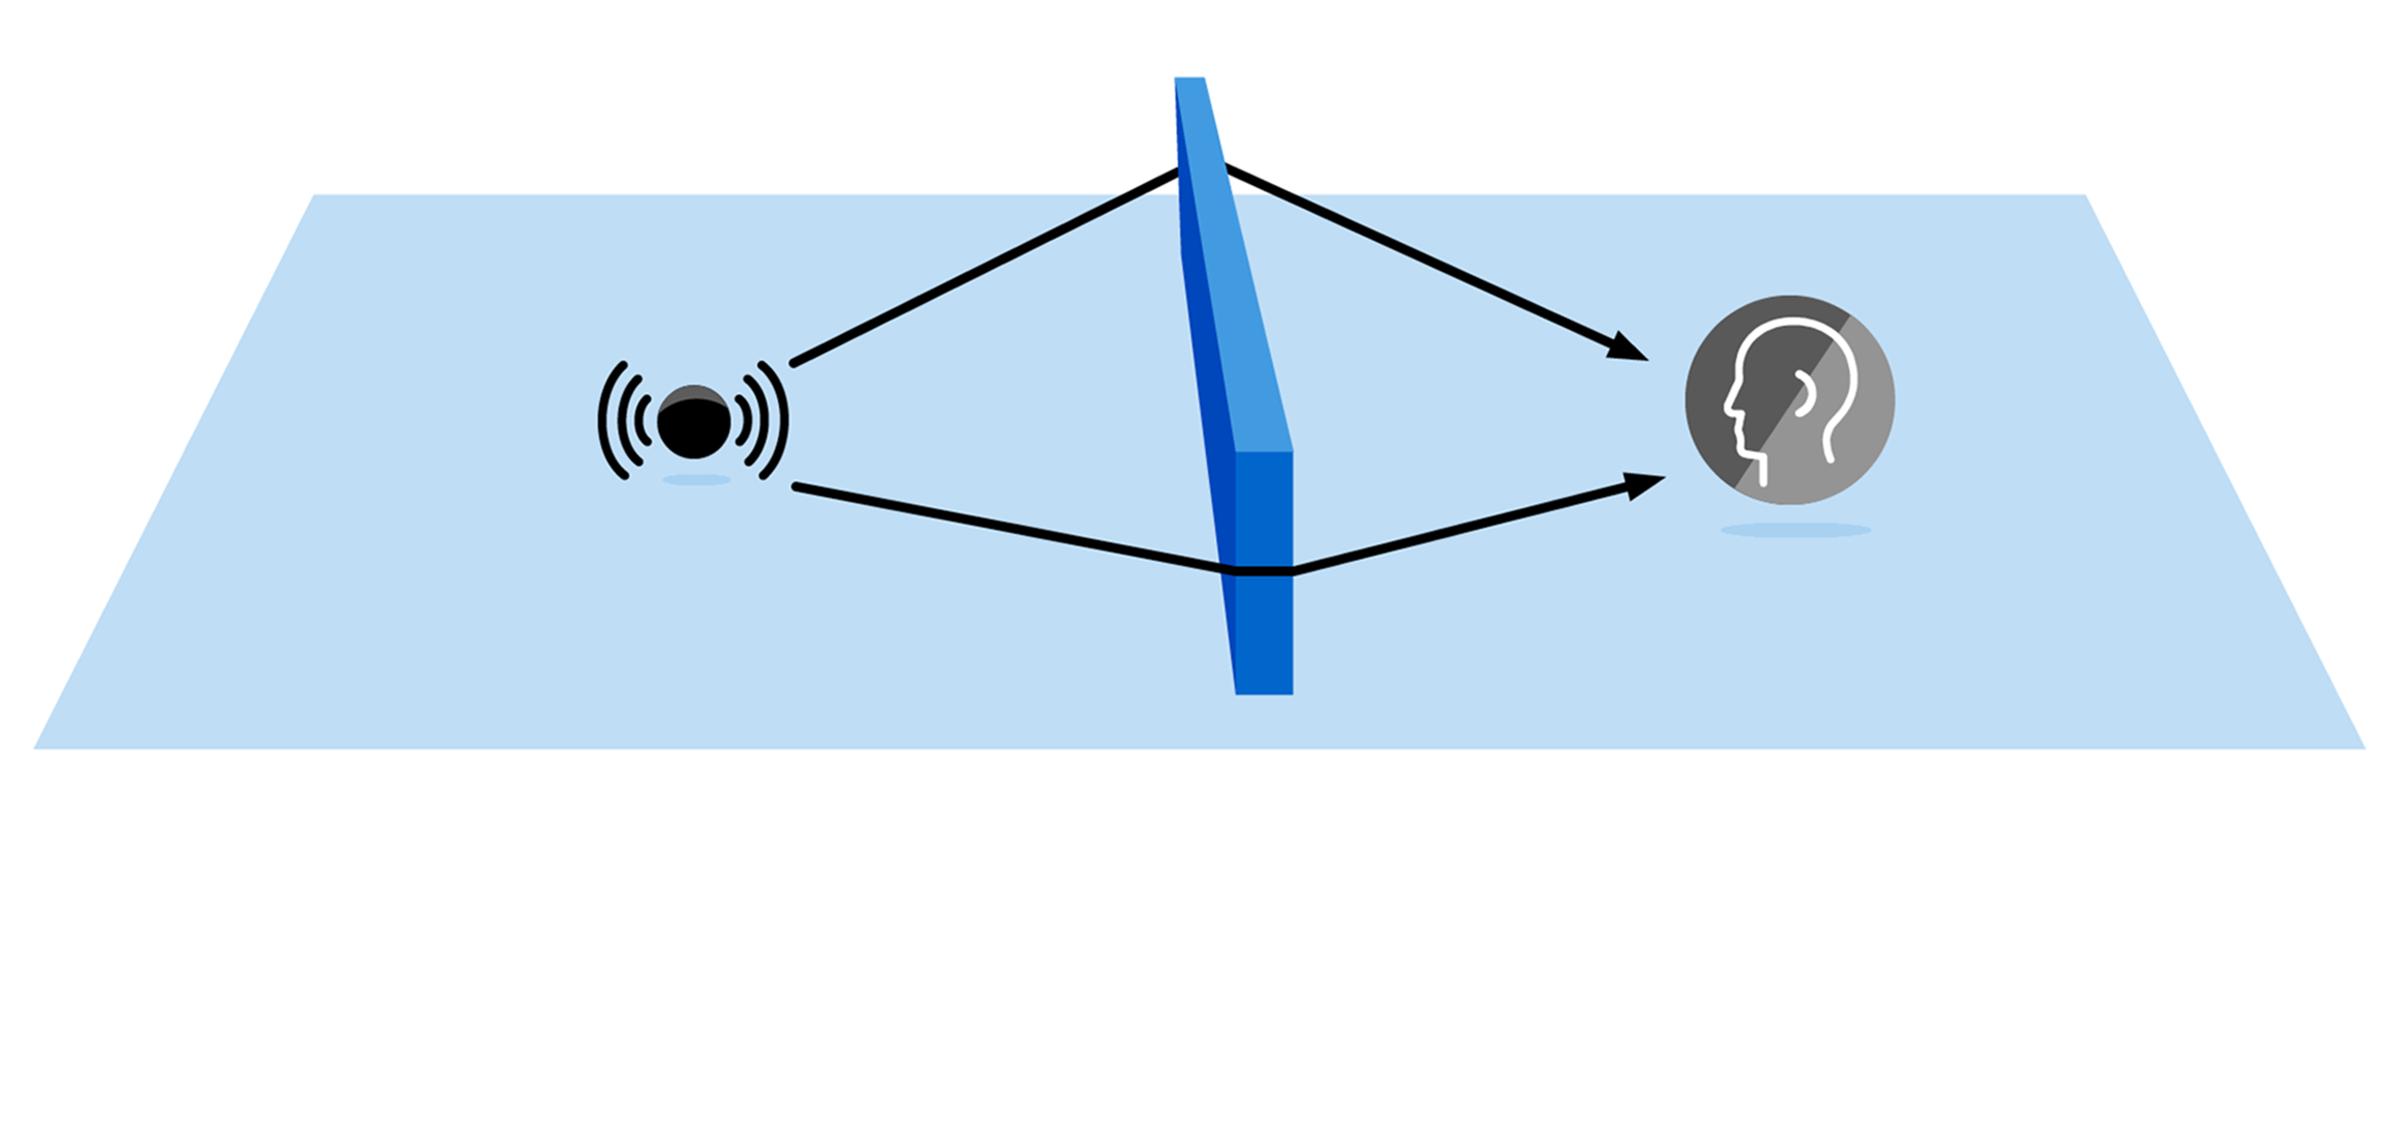 Project Triton sound obstruction